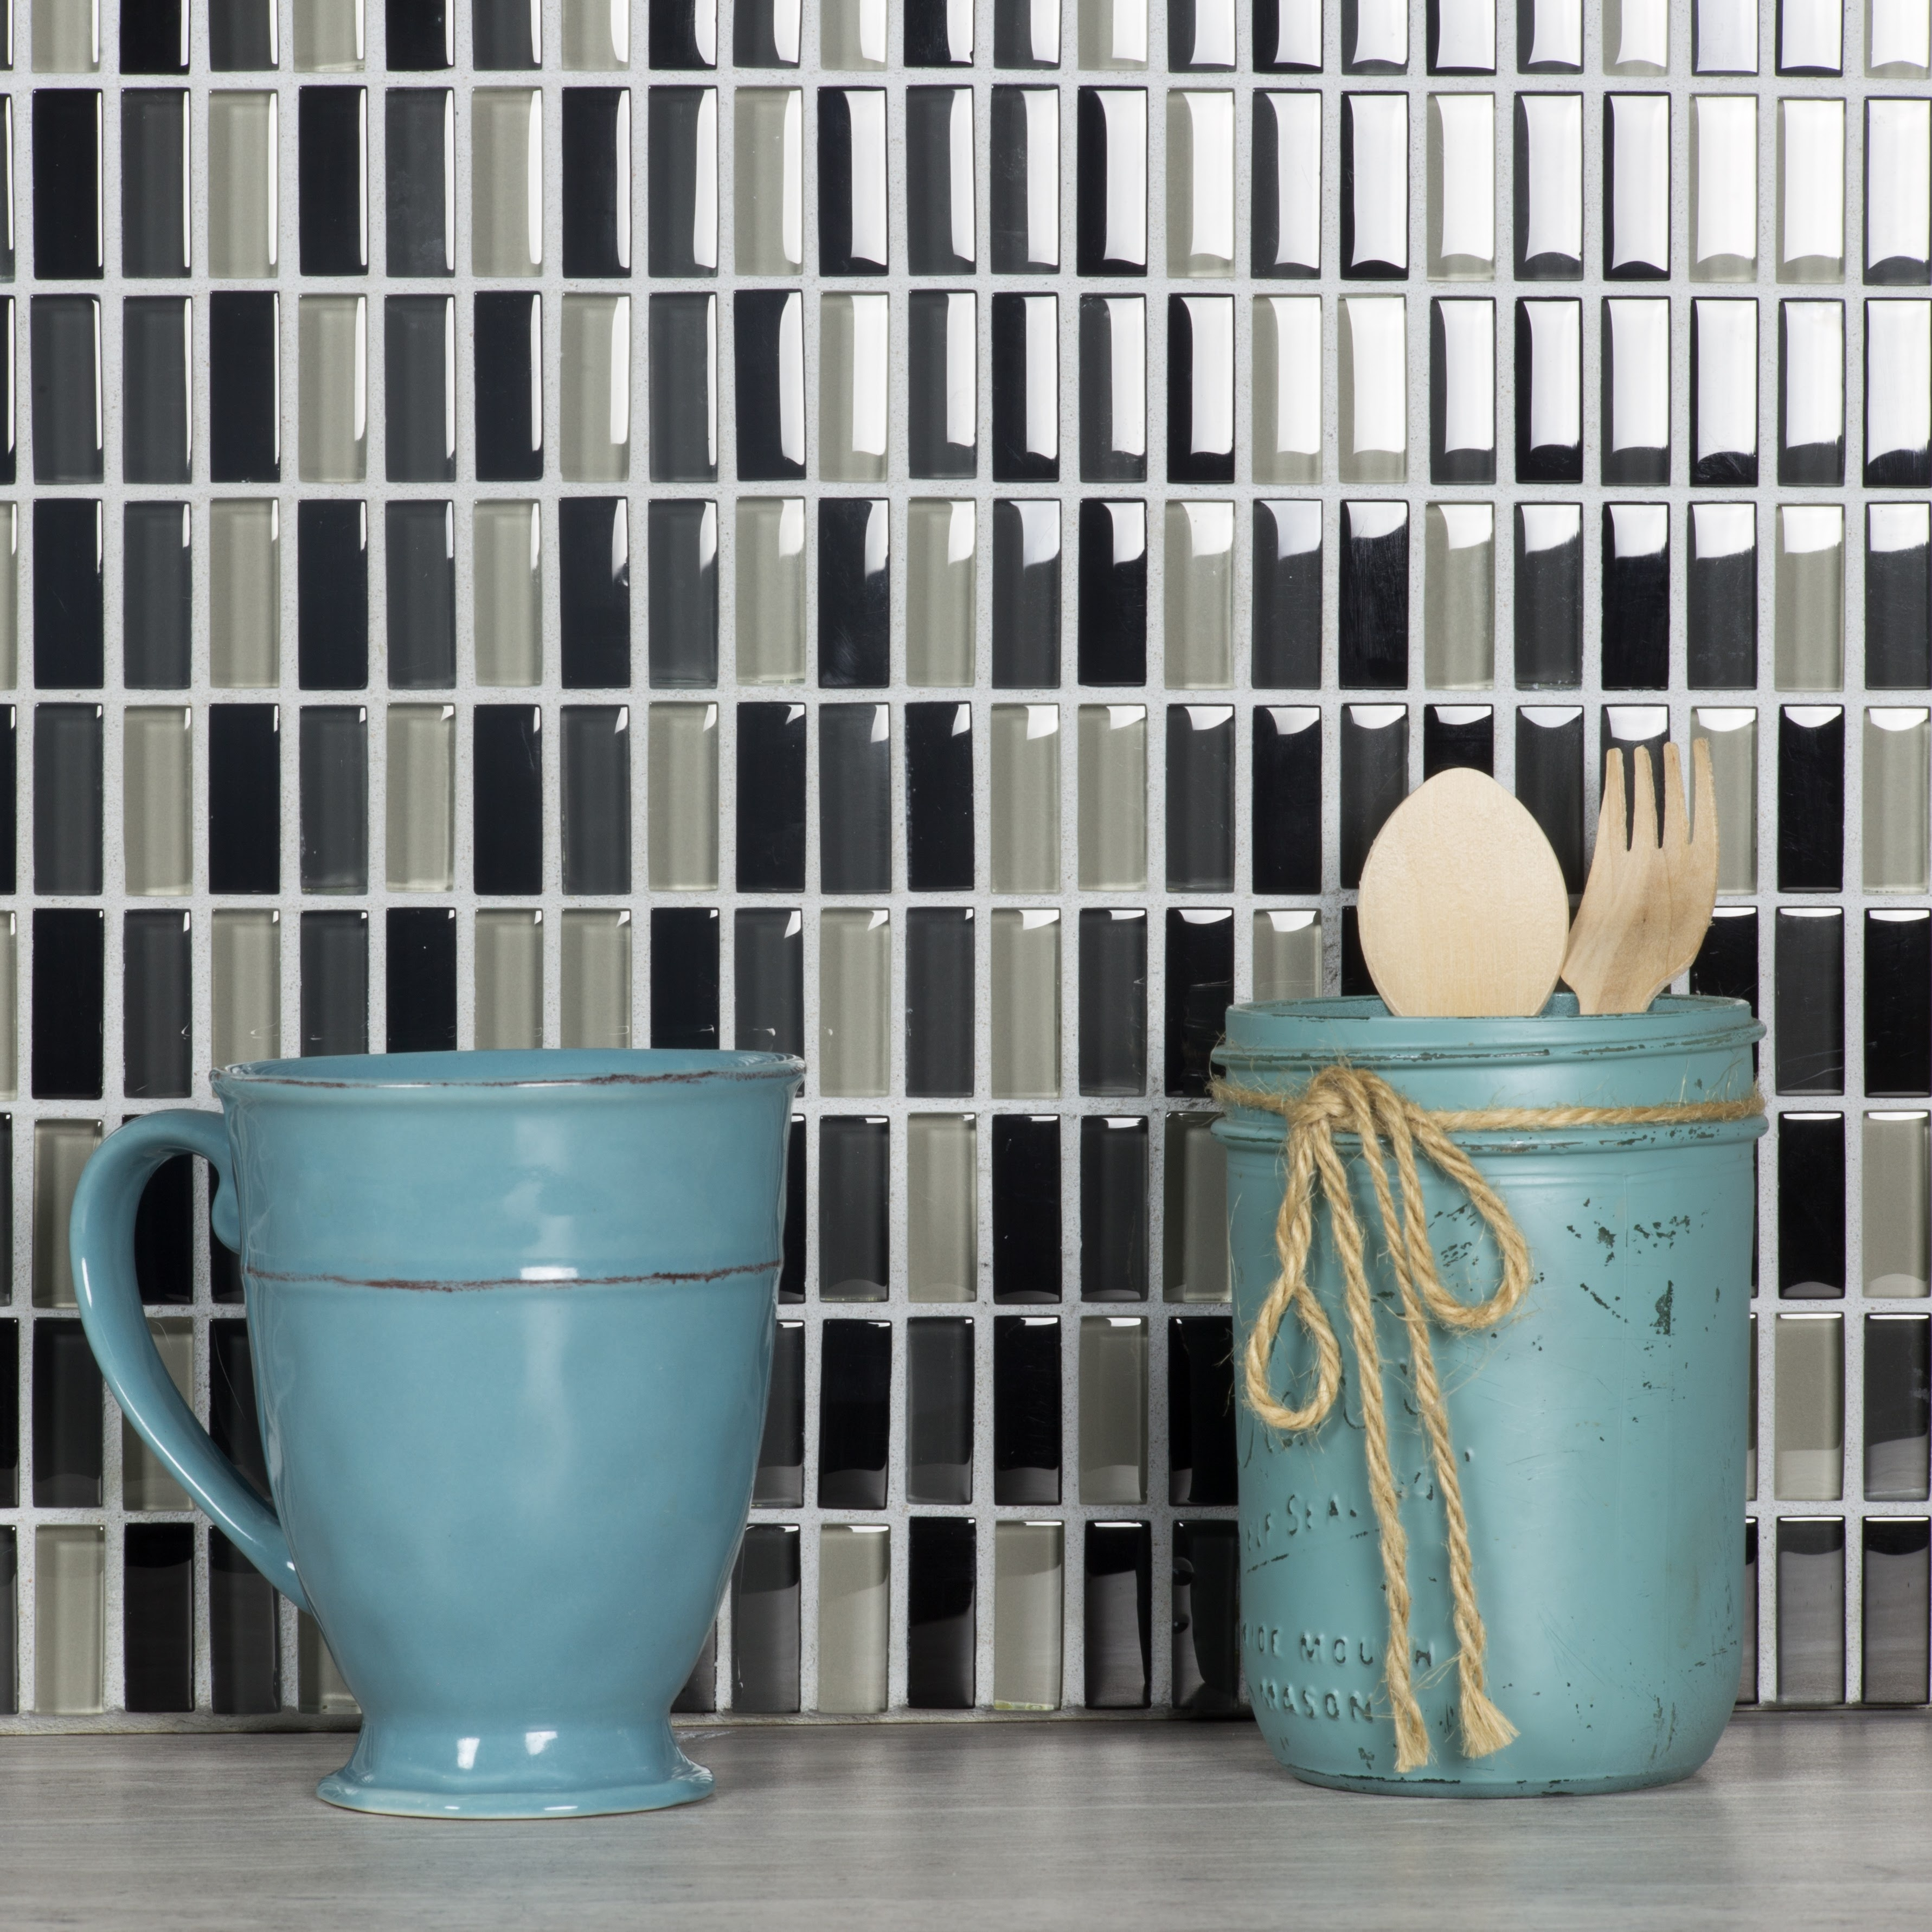 "Epiphany 0.5"" x 1.25"" Glossy Black Glass Mosaic Backsplash Mosaic Wall & Floor Tile"